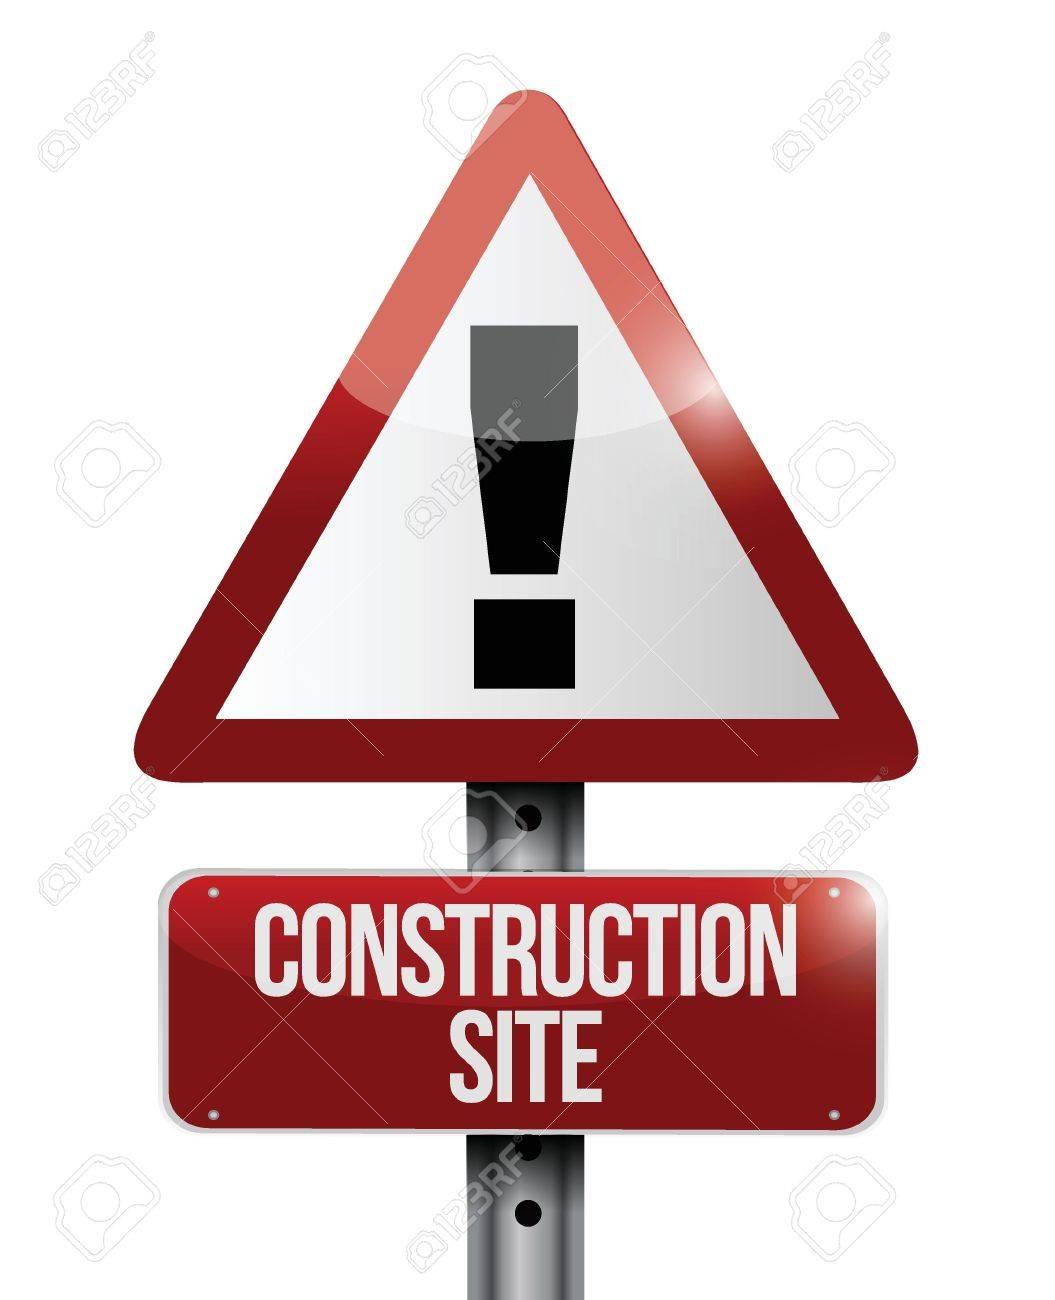 construction site warning road sign illustration design over white